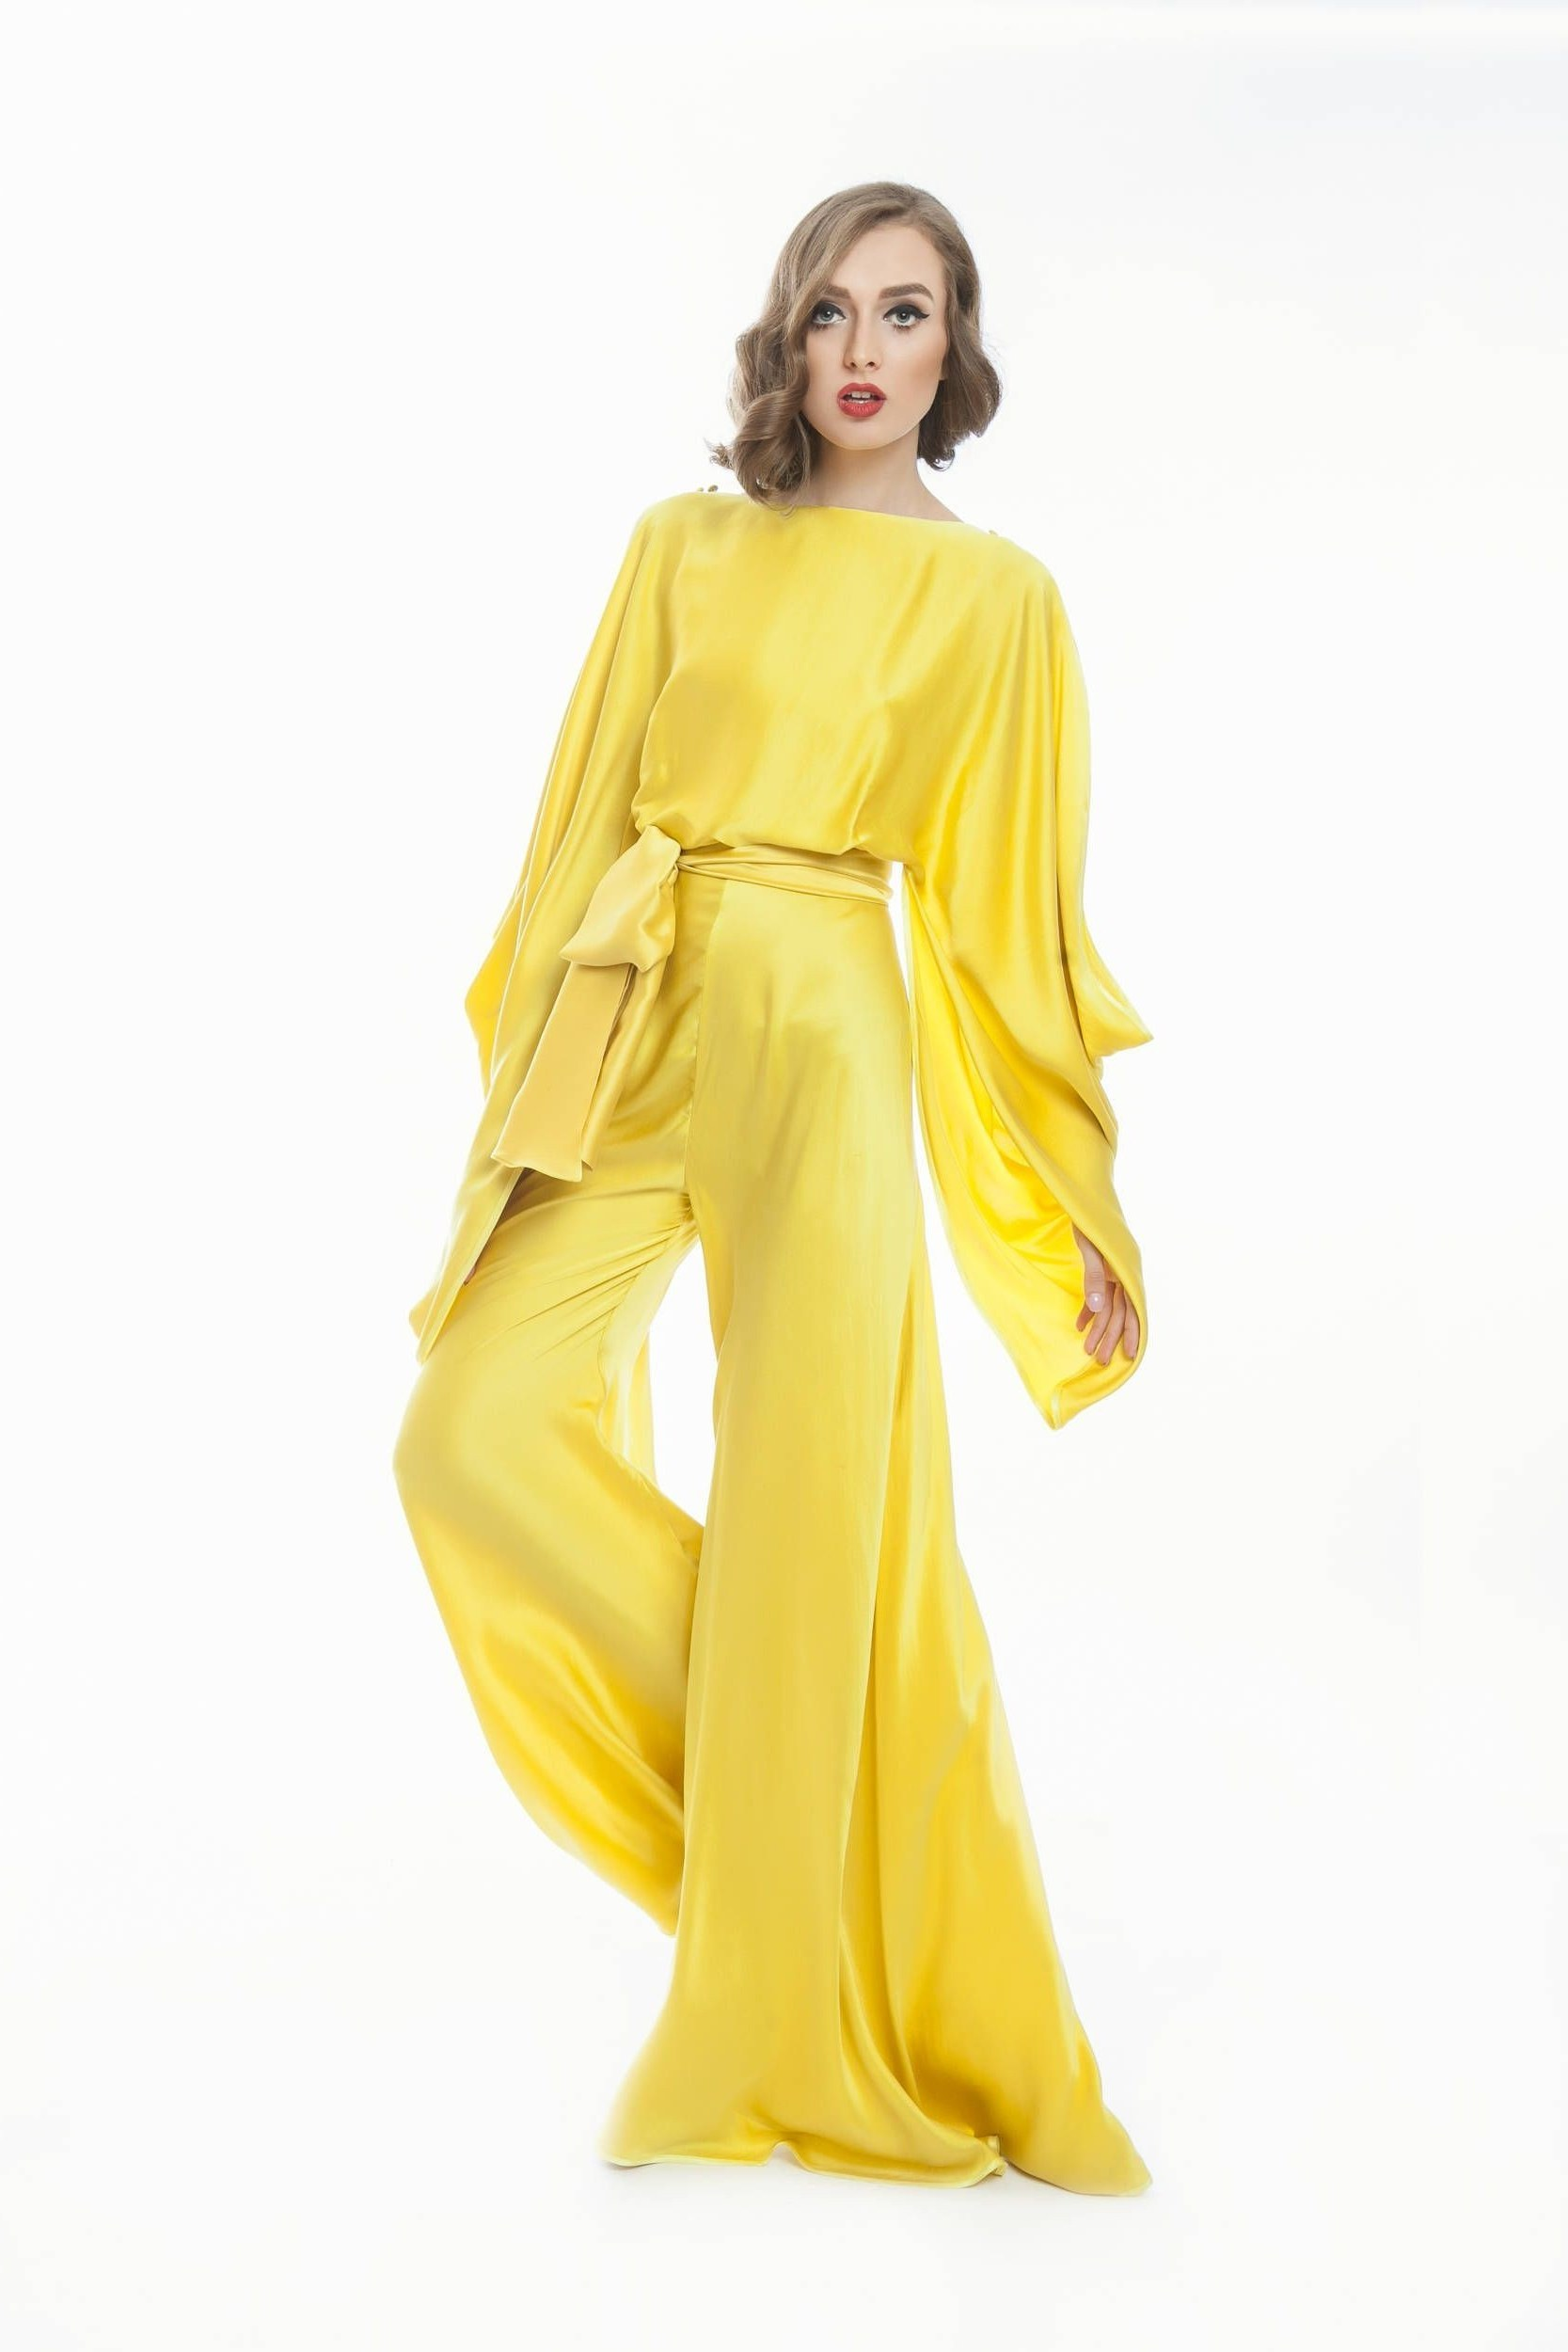 Inspirasi Baju Gaun Pengantin Muslimah Dwdk Gaun Pengantin Muslimah Bagus Jual Mainboard W210cumb 0d